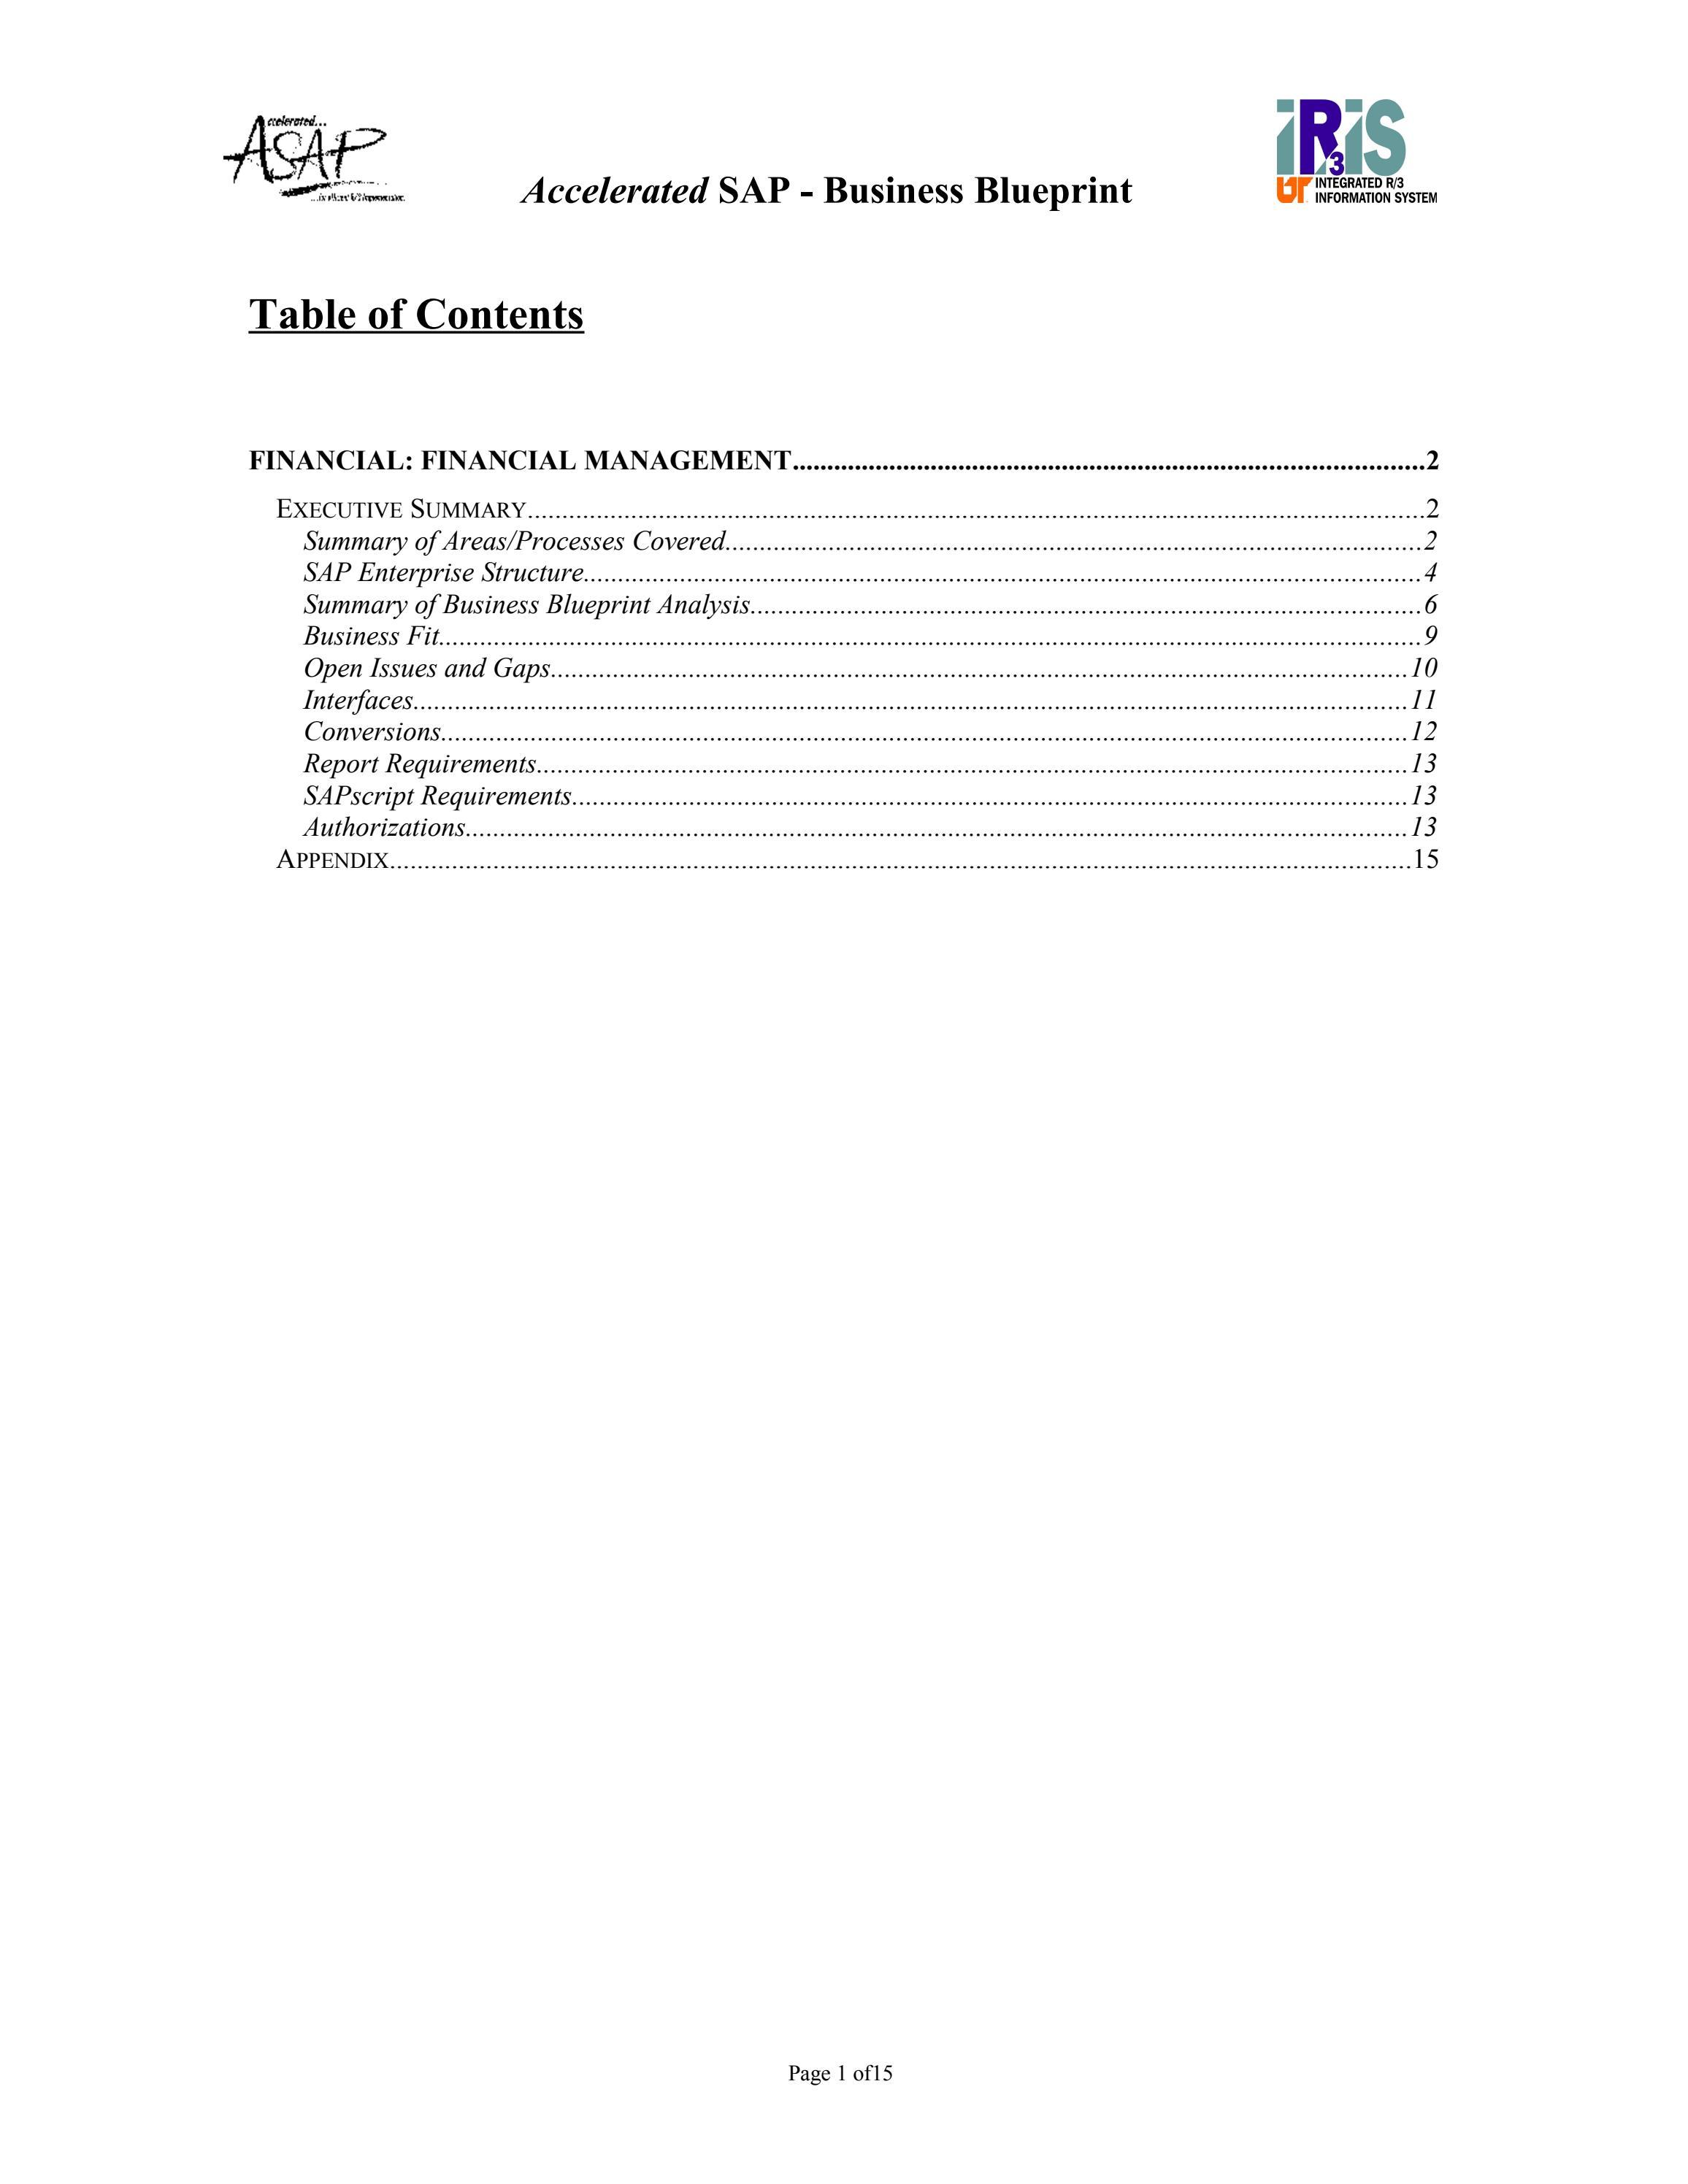 Sap fico blueprint free download